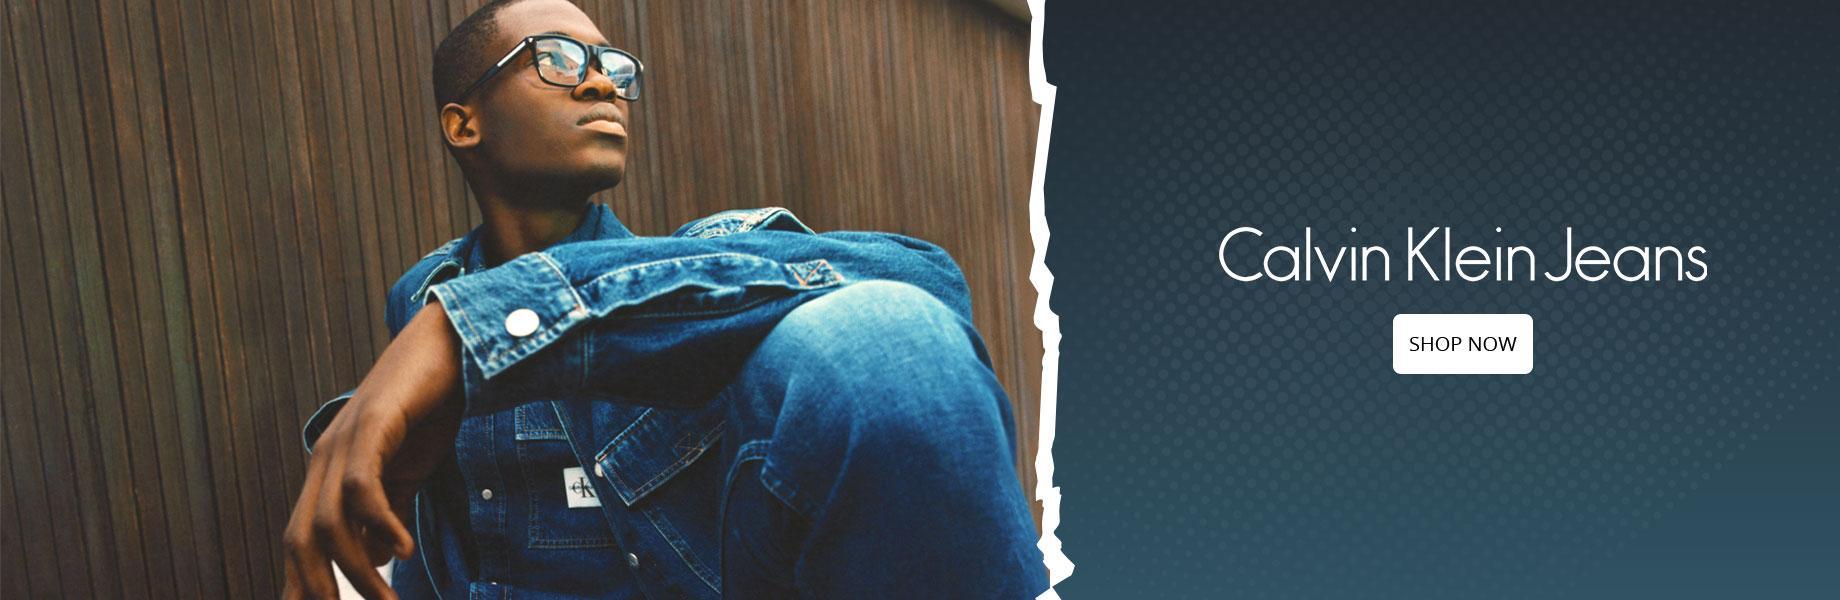 Mens-Page-Carousals-CK-Jeans-Web.jpg